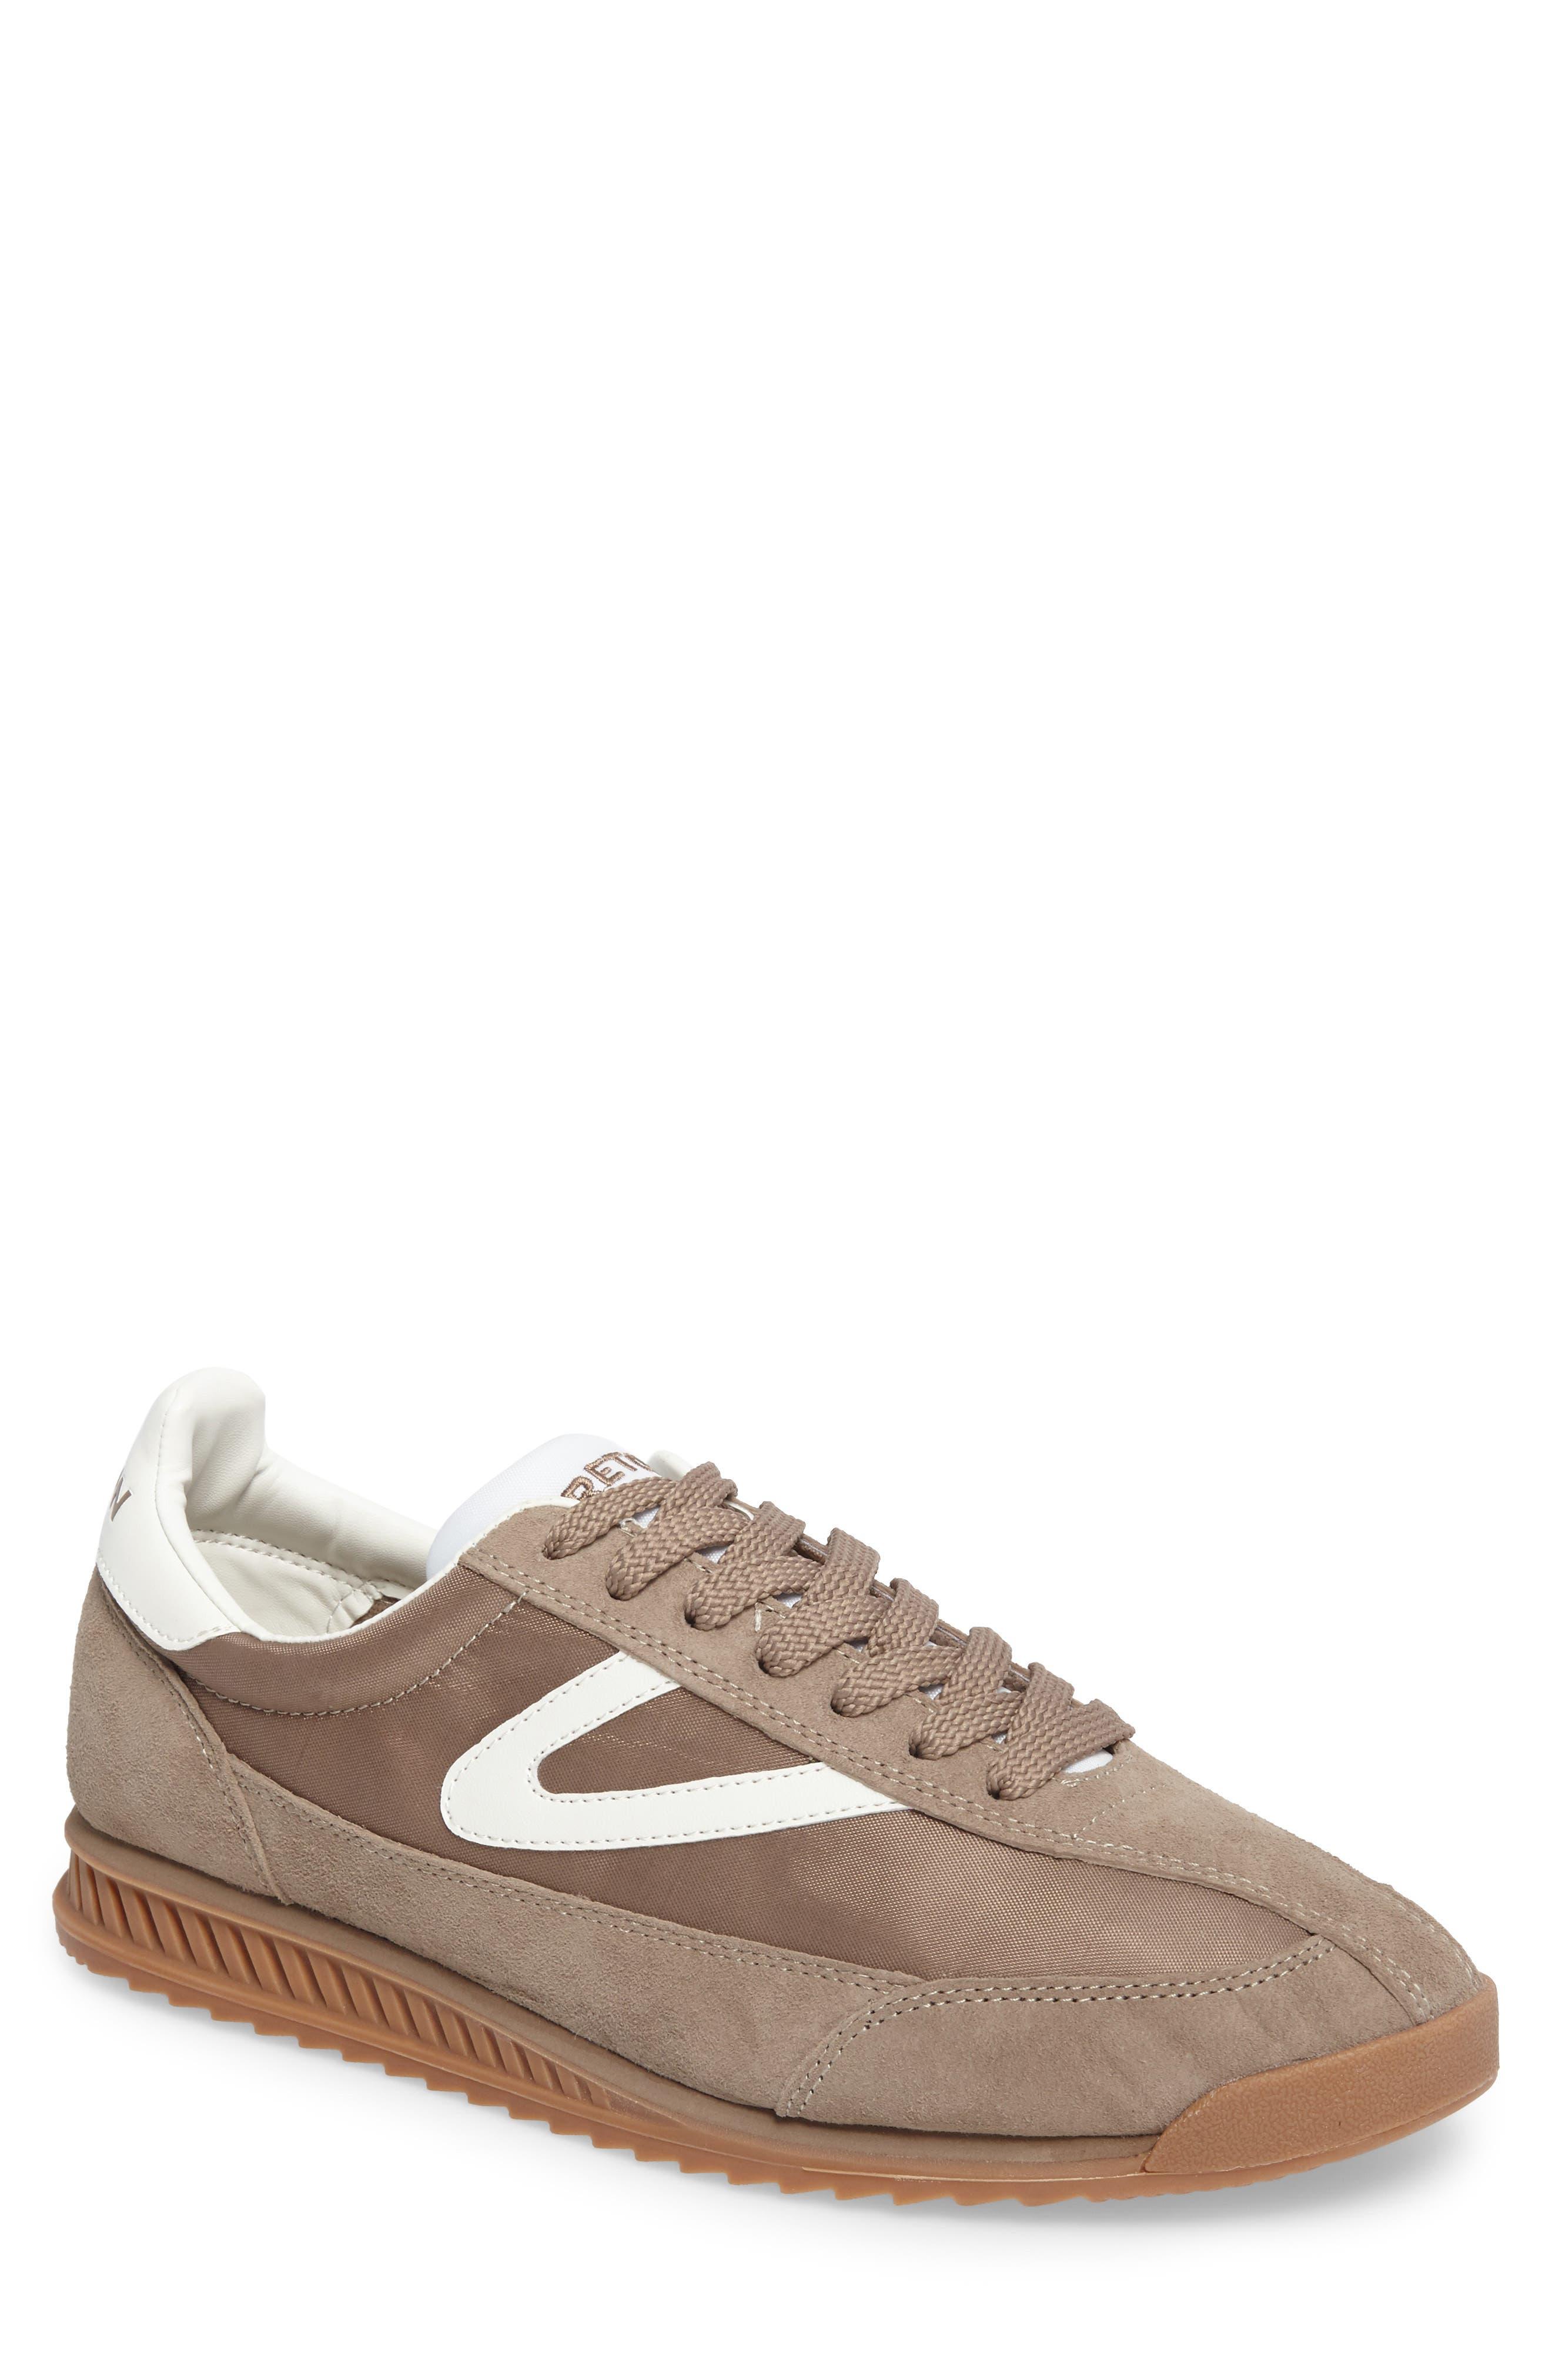 TRETORN Rawlins 3 Sneaker